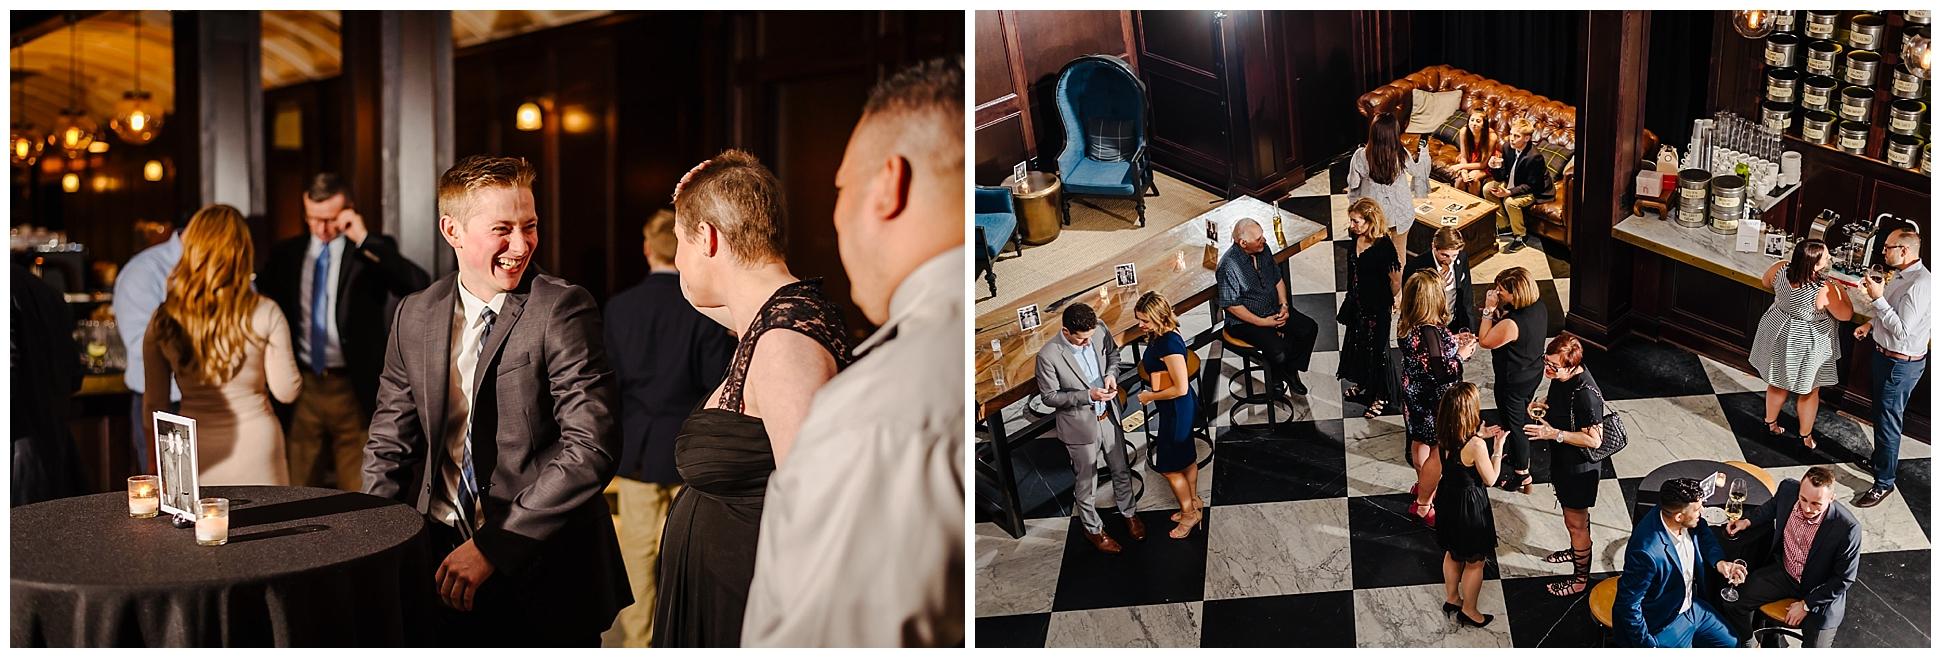 luxury-oxford-exchange-wedding-rehearsal-dinner-same-sex_0008.jpg